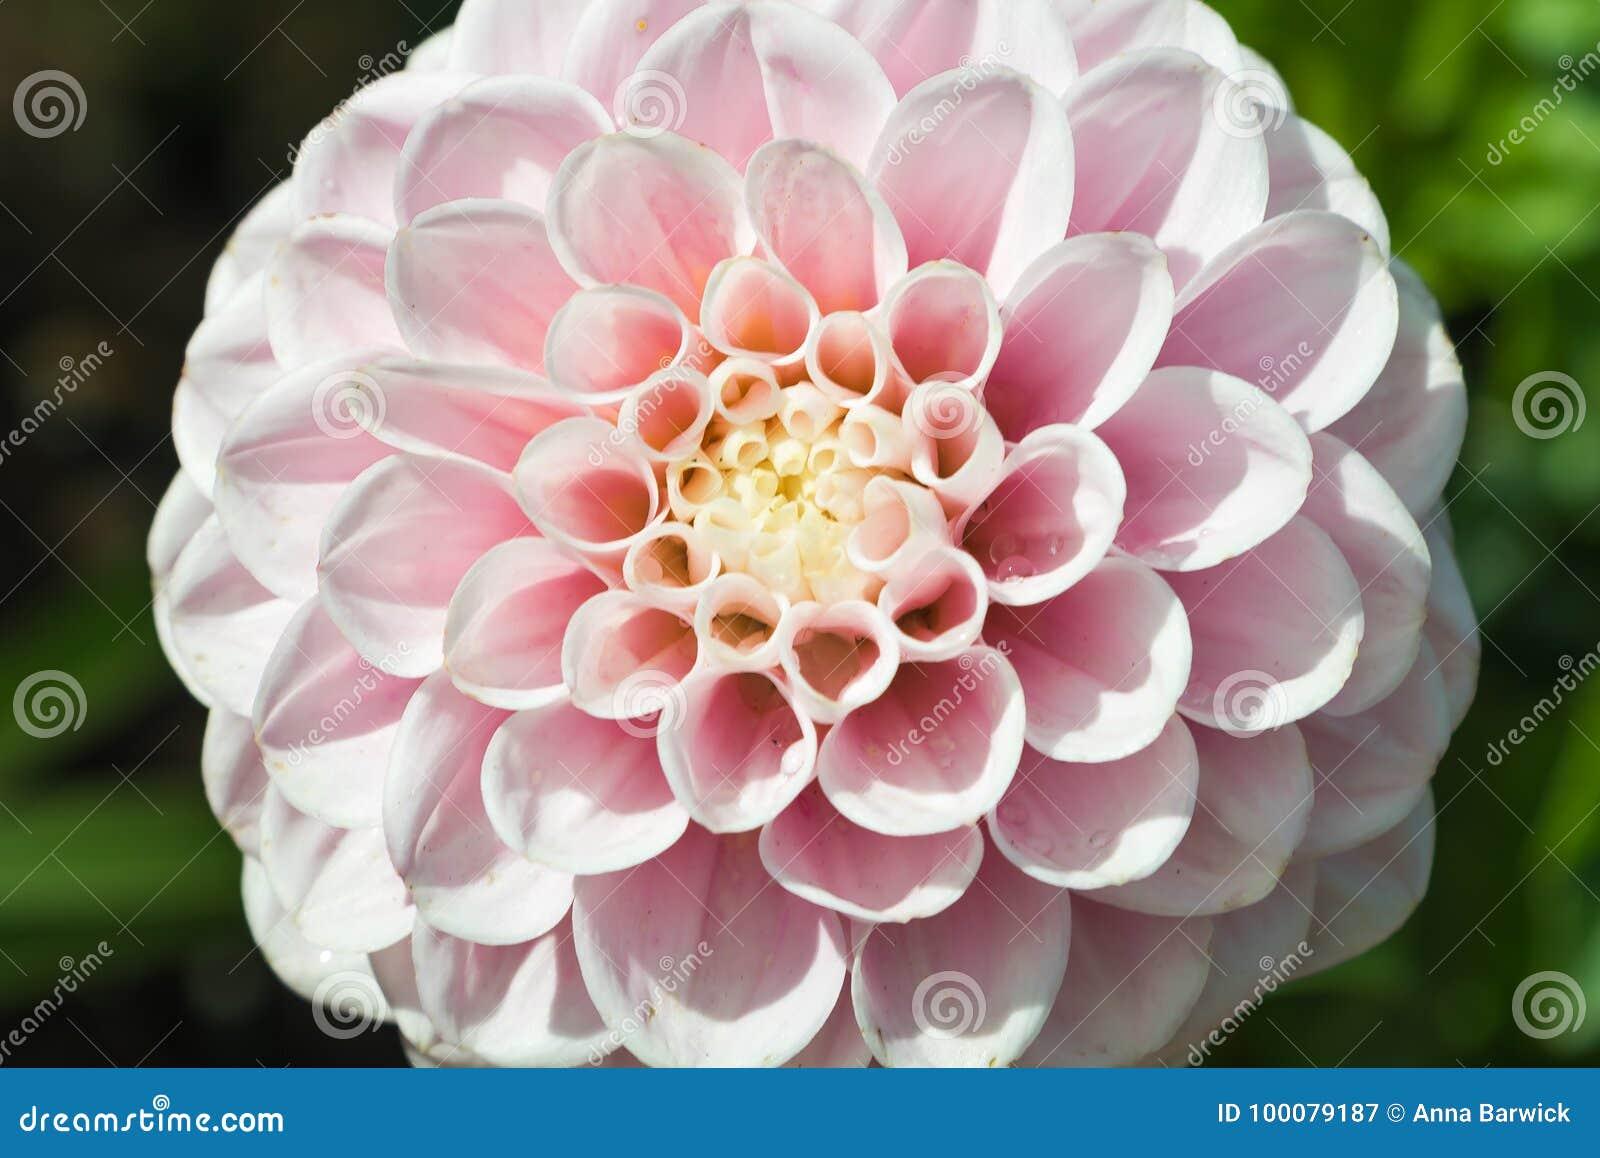 Pink Pompom Dahlia Flower Stock Image Image Of Garden 100079187